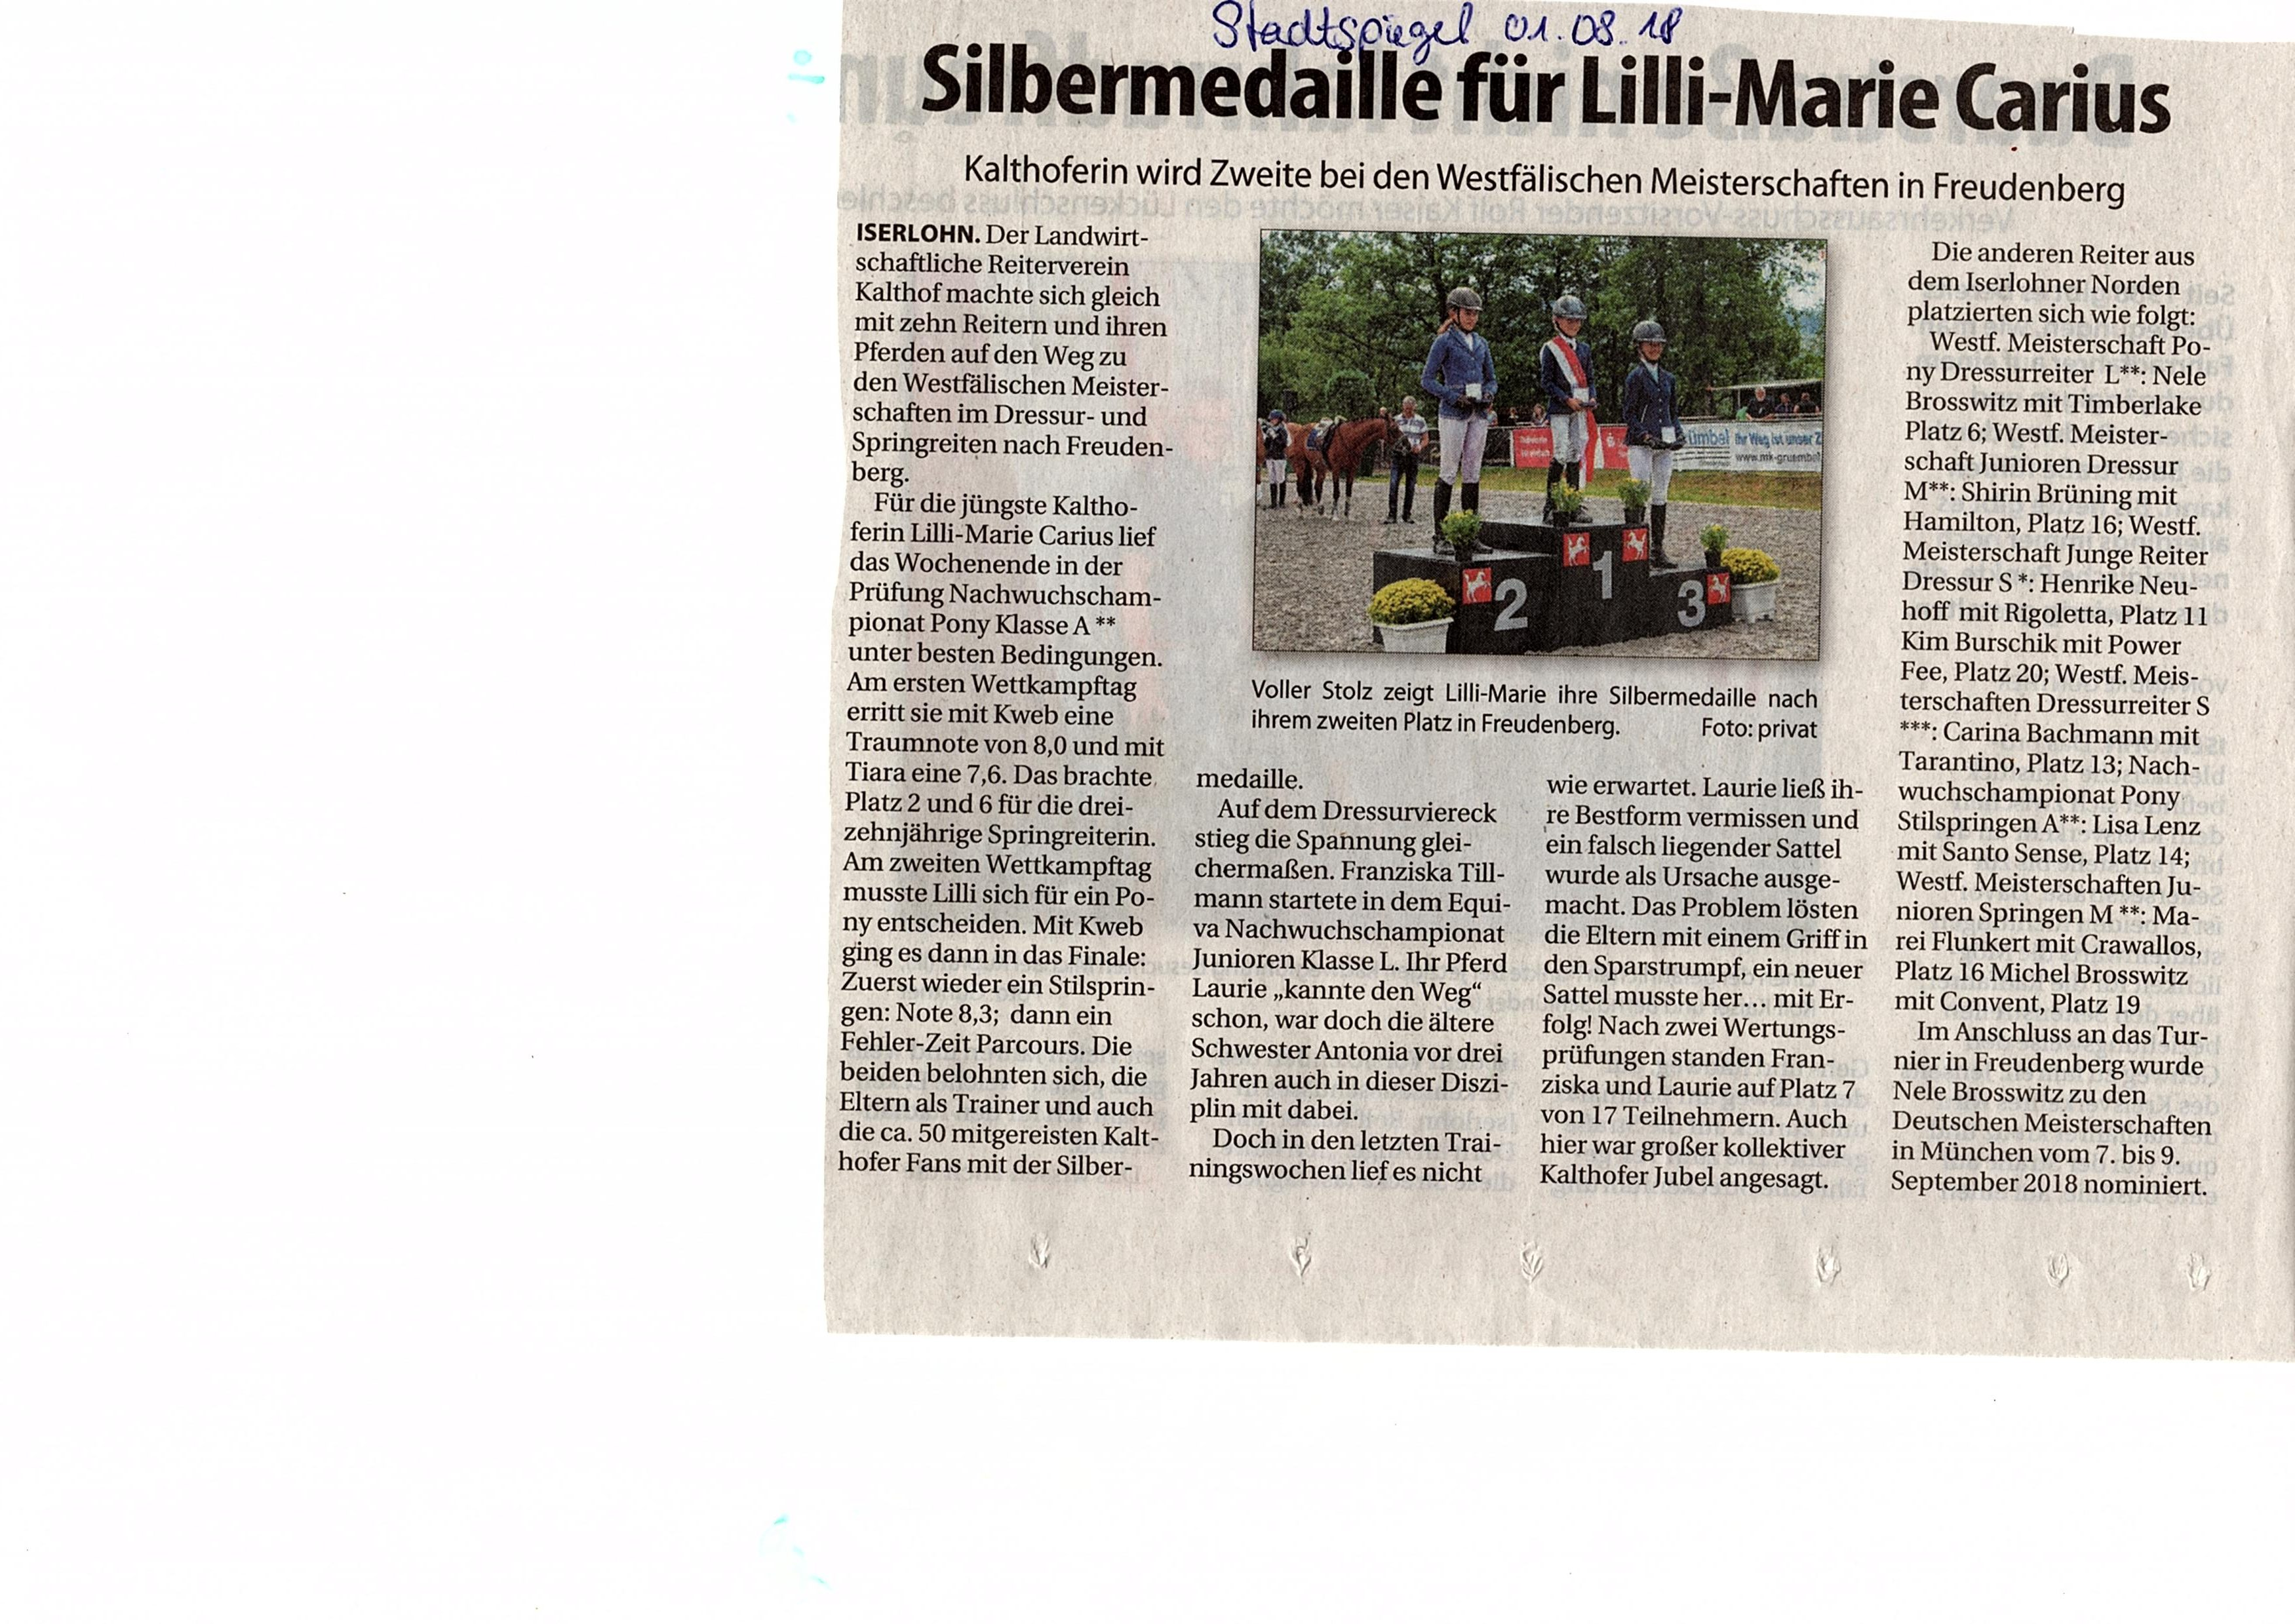 Stadtspiegel 01.08.2018 - Westfälische Meisterschaften